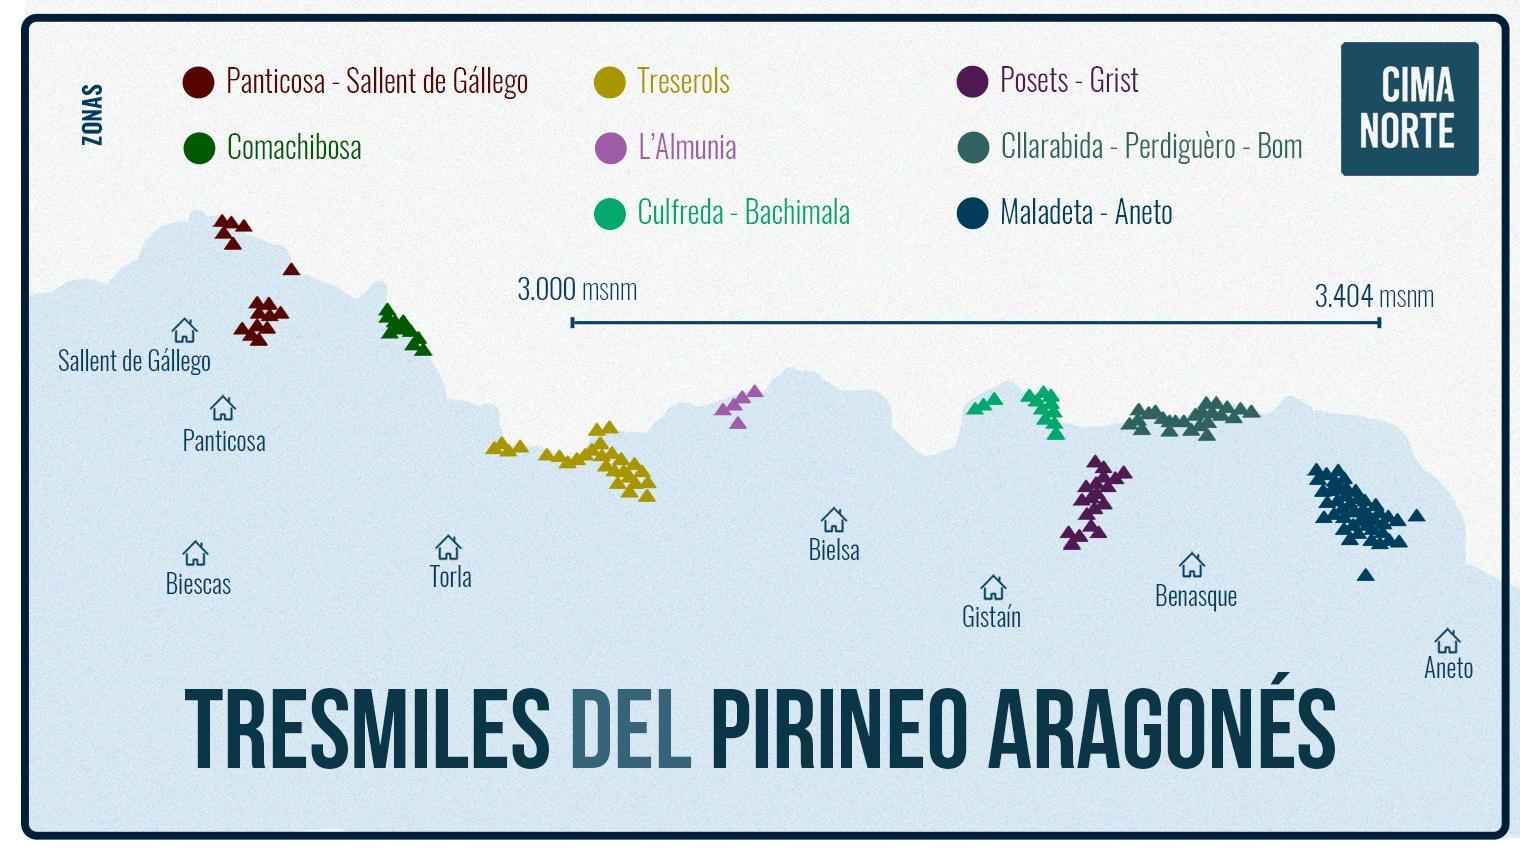 mapa tresmiles del pirineo aragonés infografia cima norte pirineo